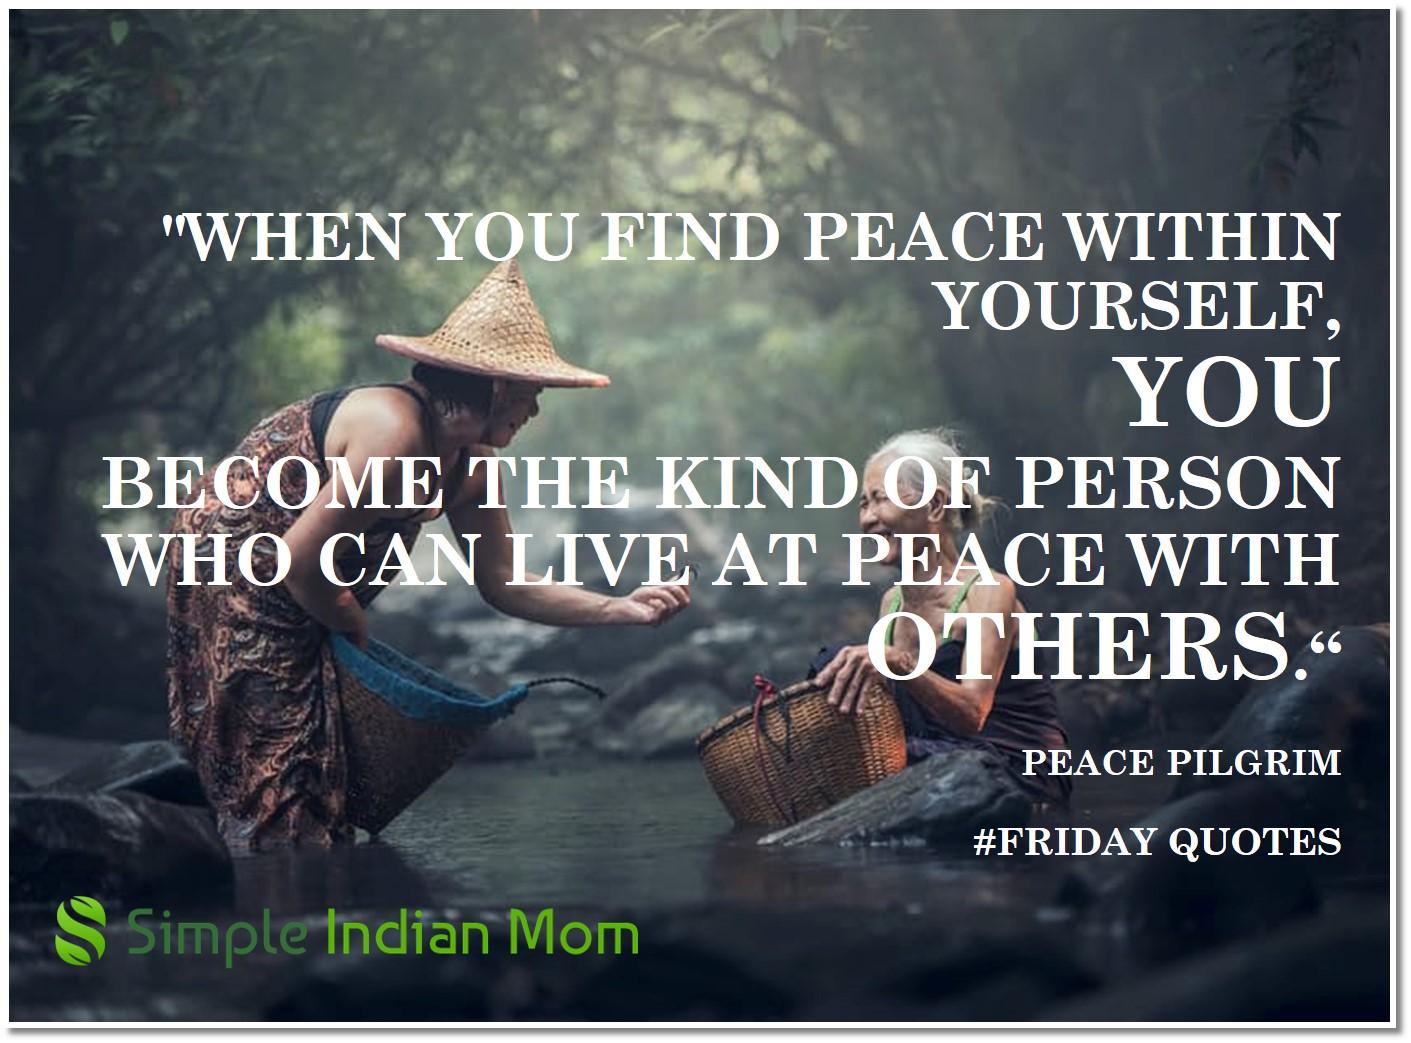 FridayQuotes - Mindfulness